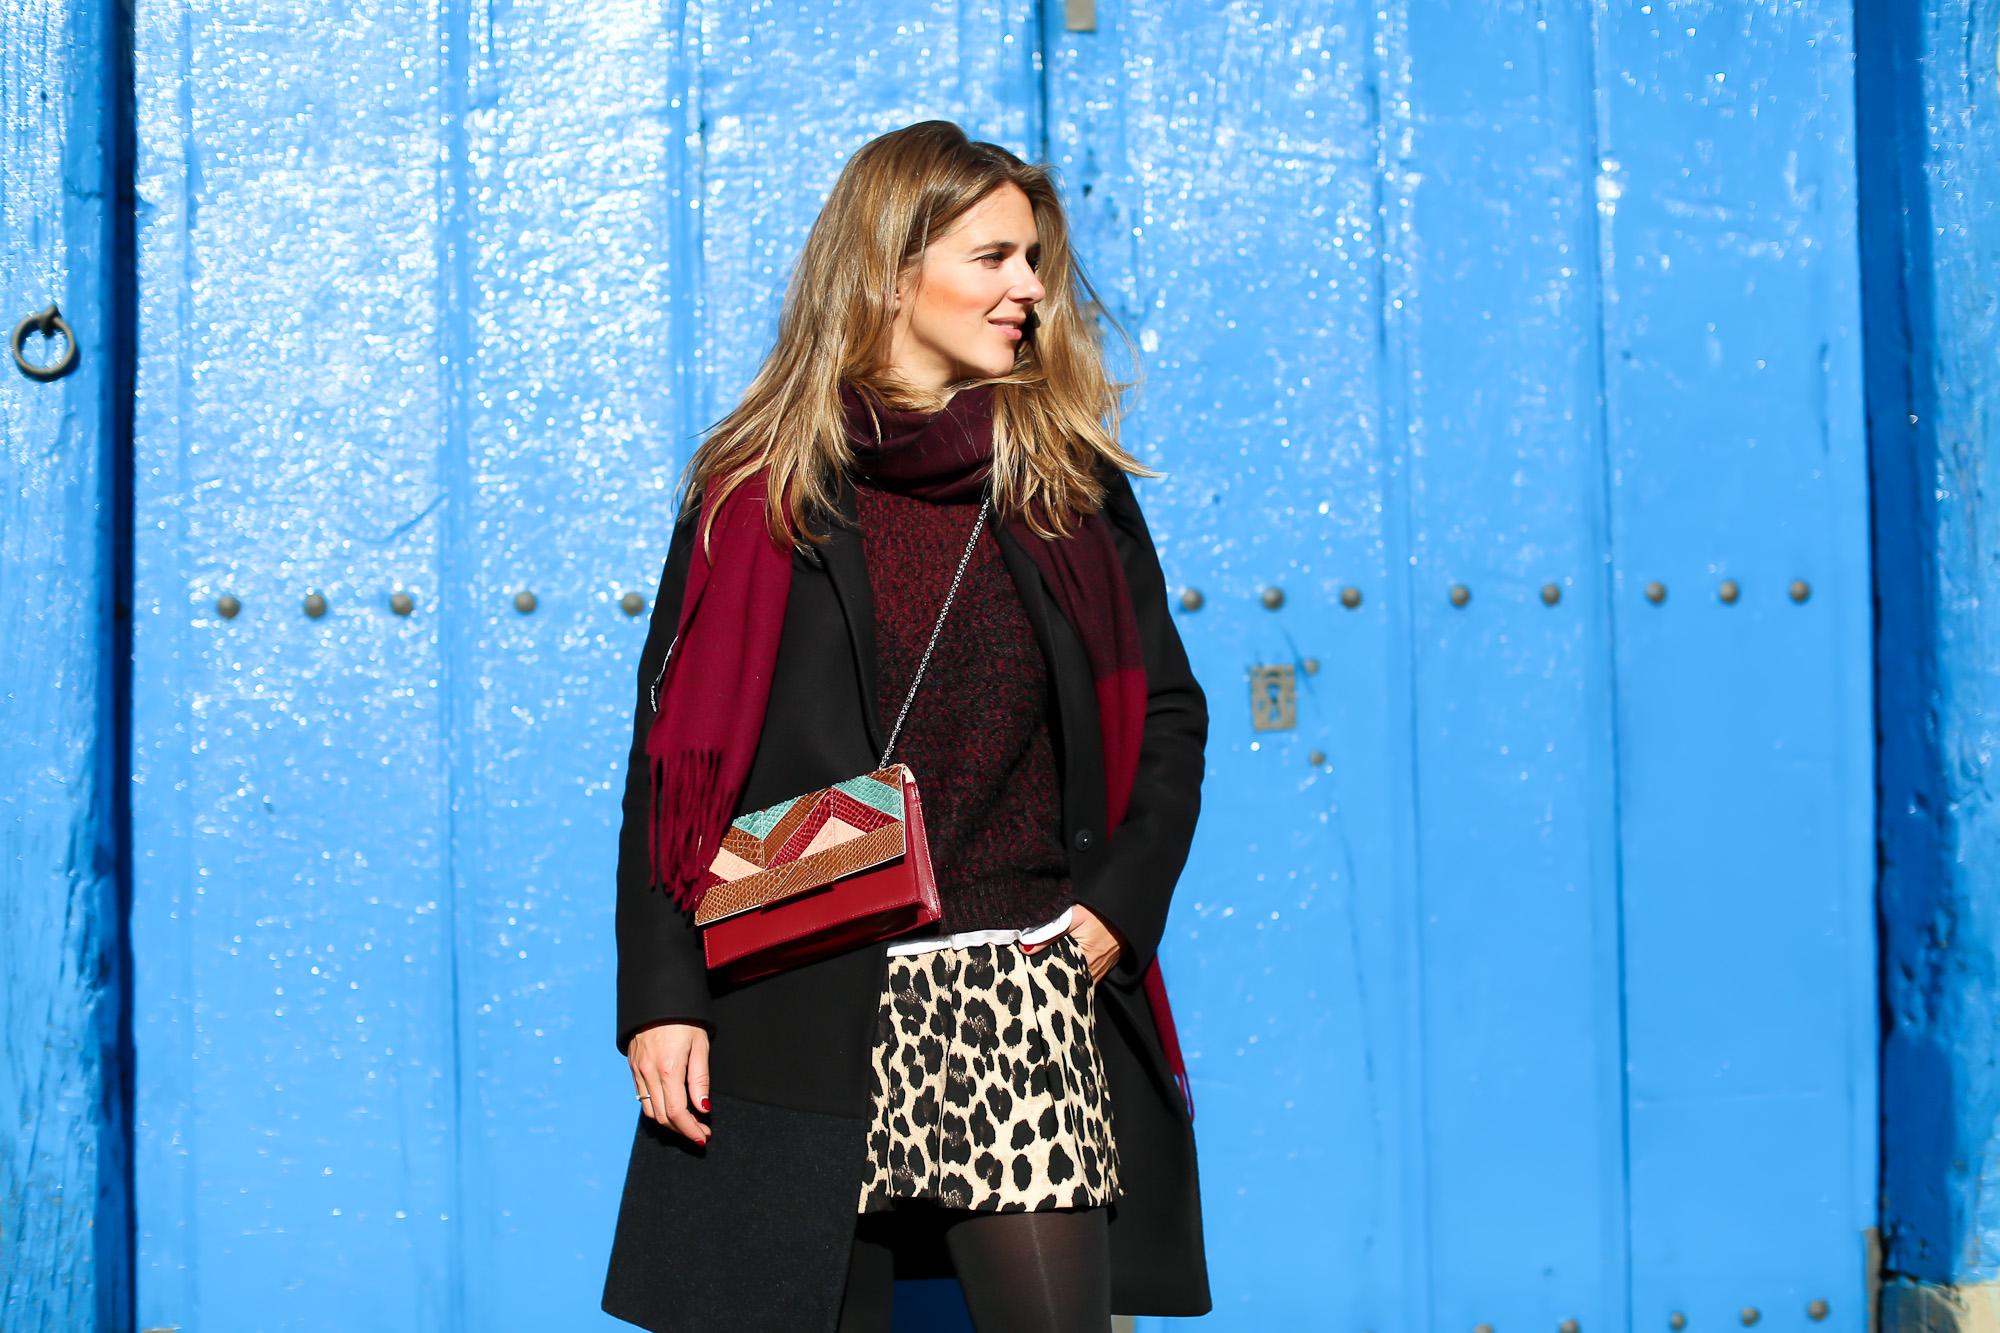 Clochet_streetstyle_fashionblogger_IKKSwoolknit_titamadridspigagranate_sandrobrogues_zaraleopardshorts-5